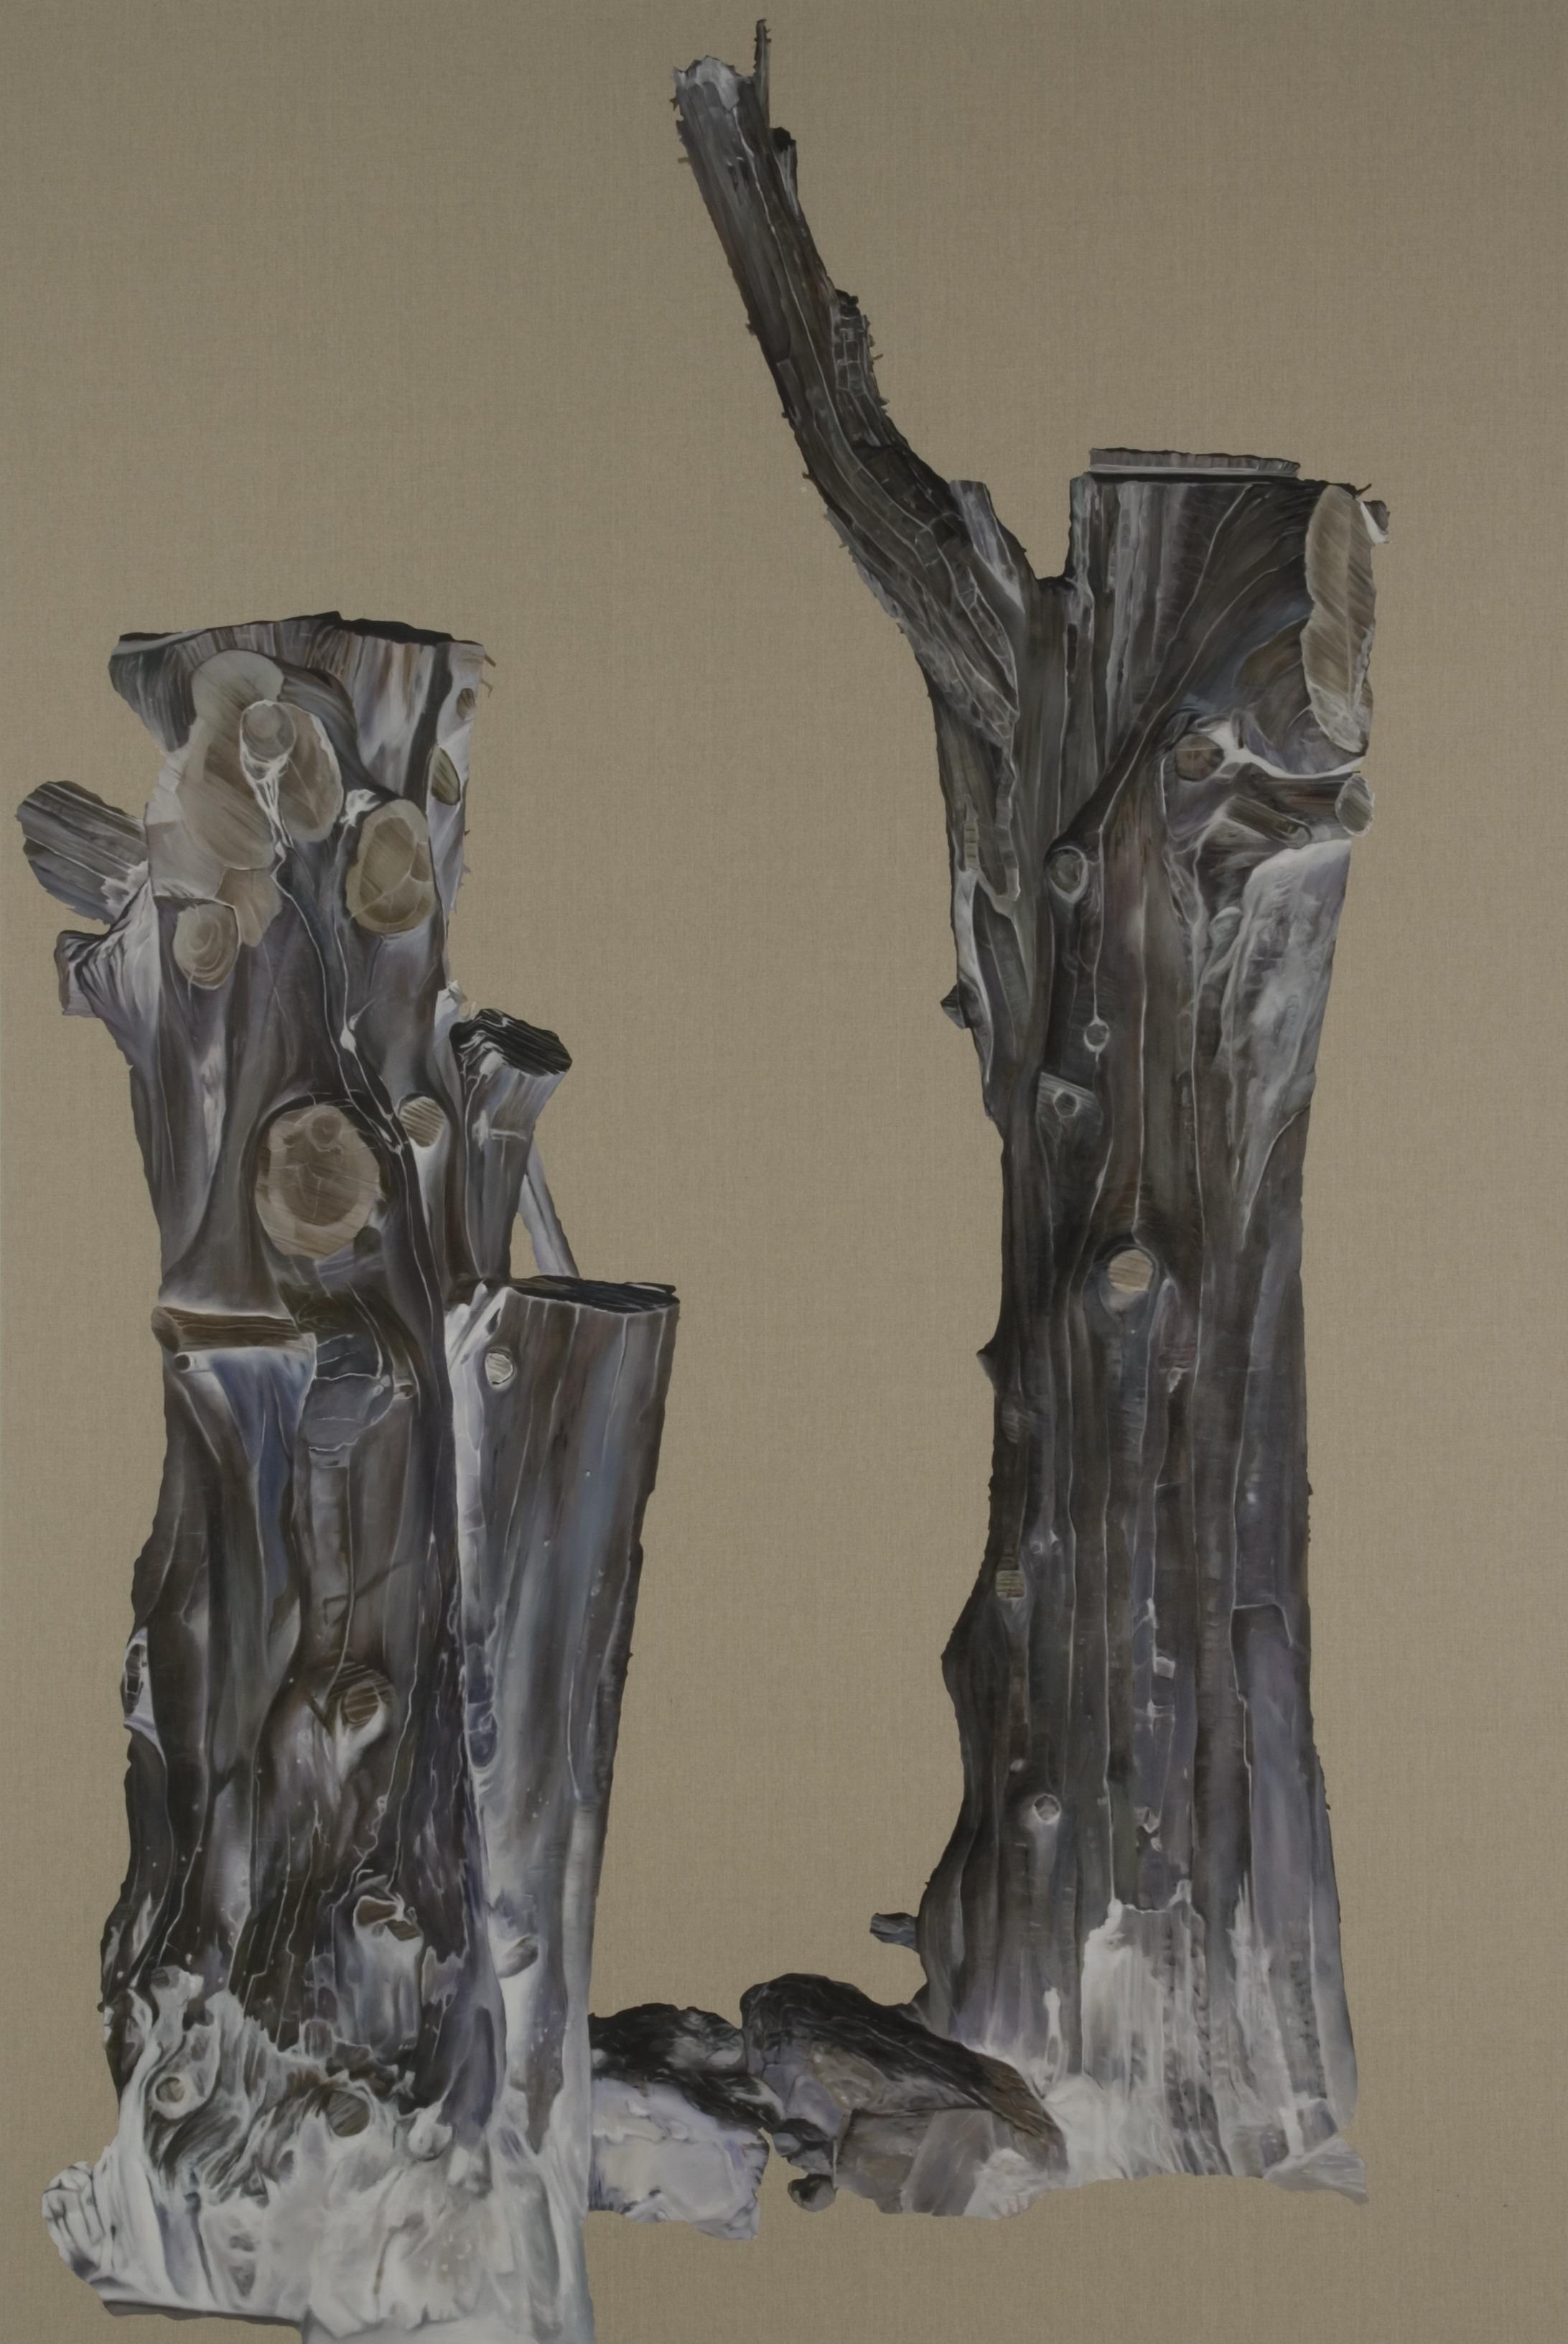 JOHN YOUNG     Crippled Tree #2  2010 Oil on linen 274 x 183 cm